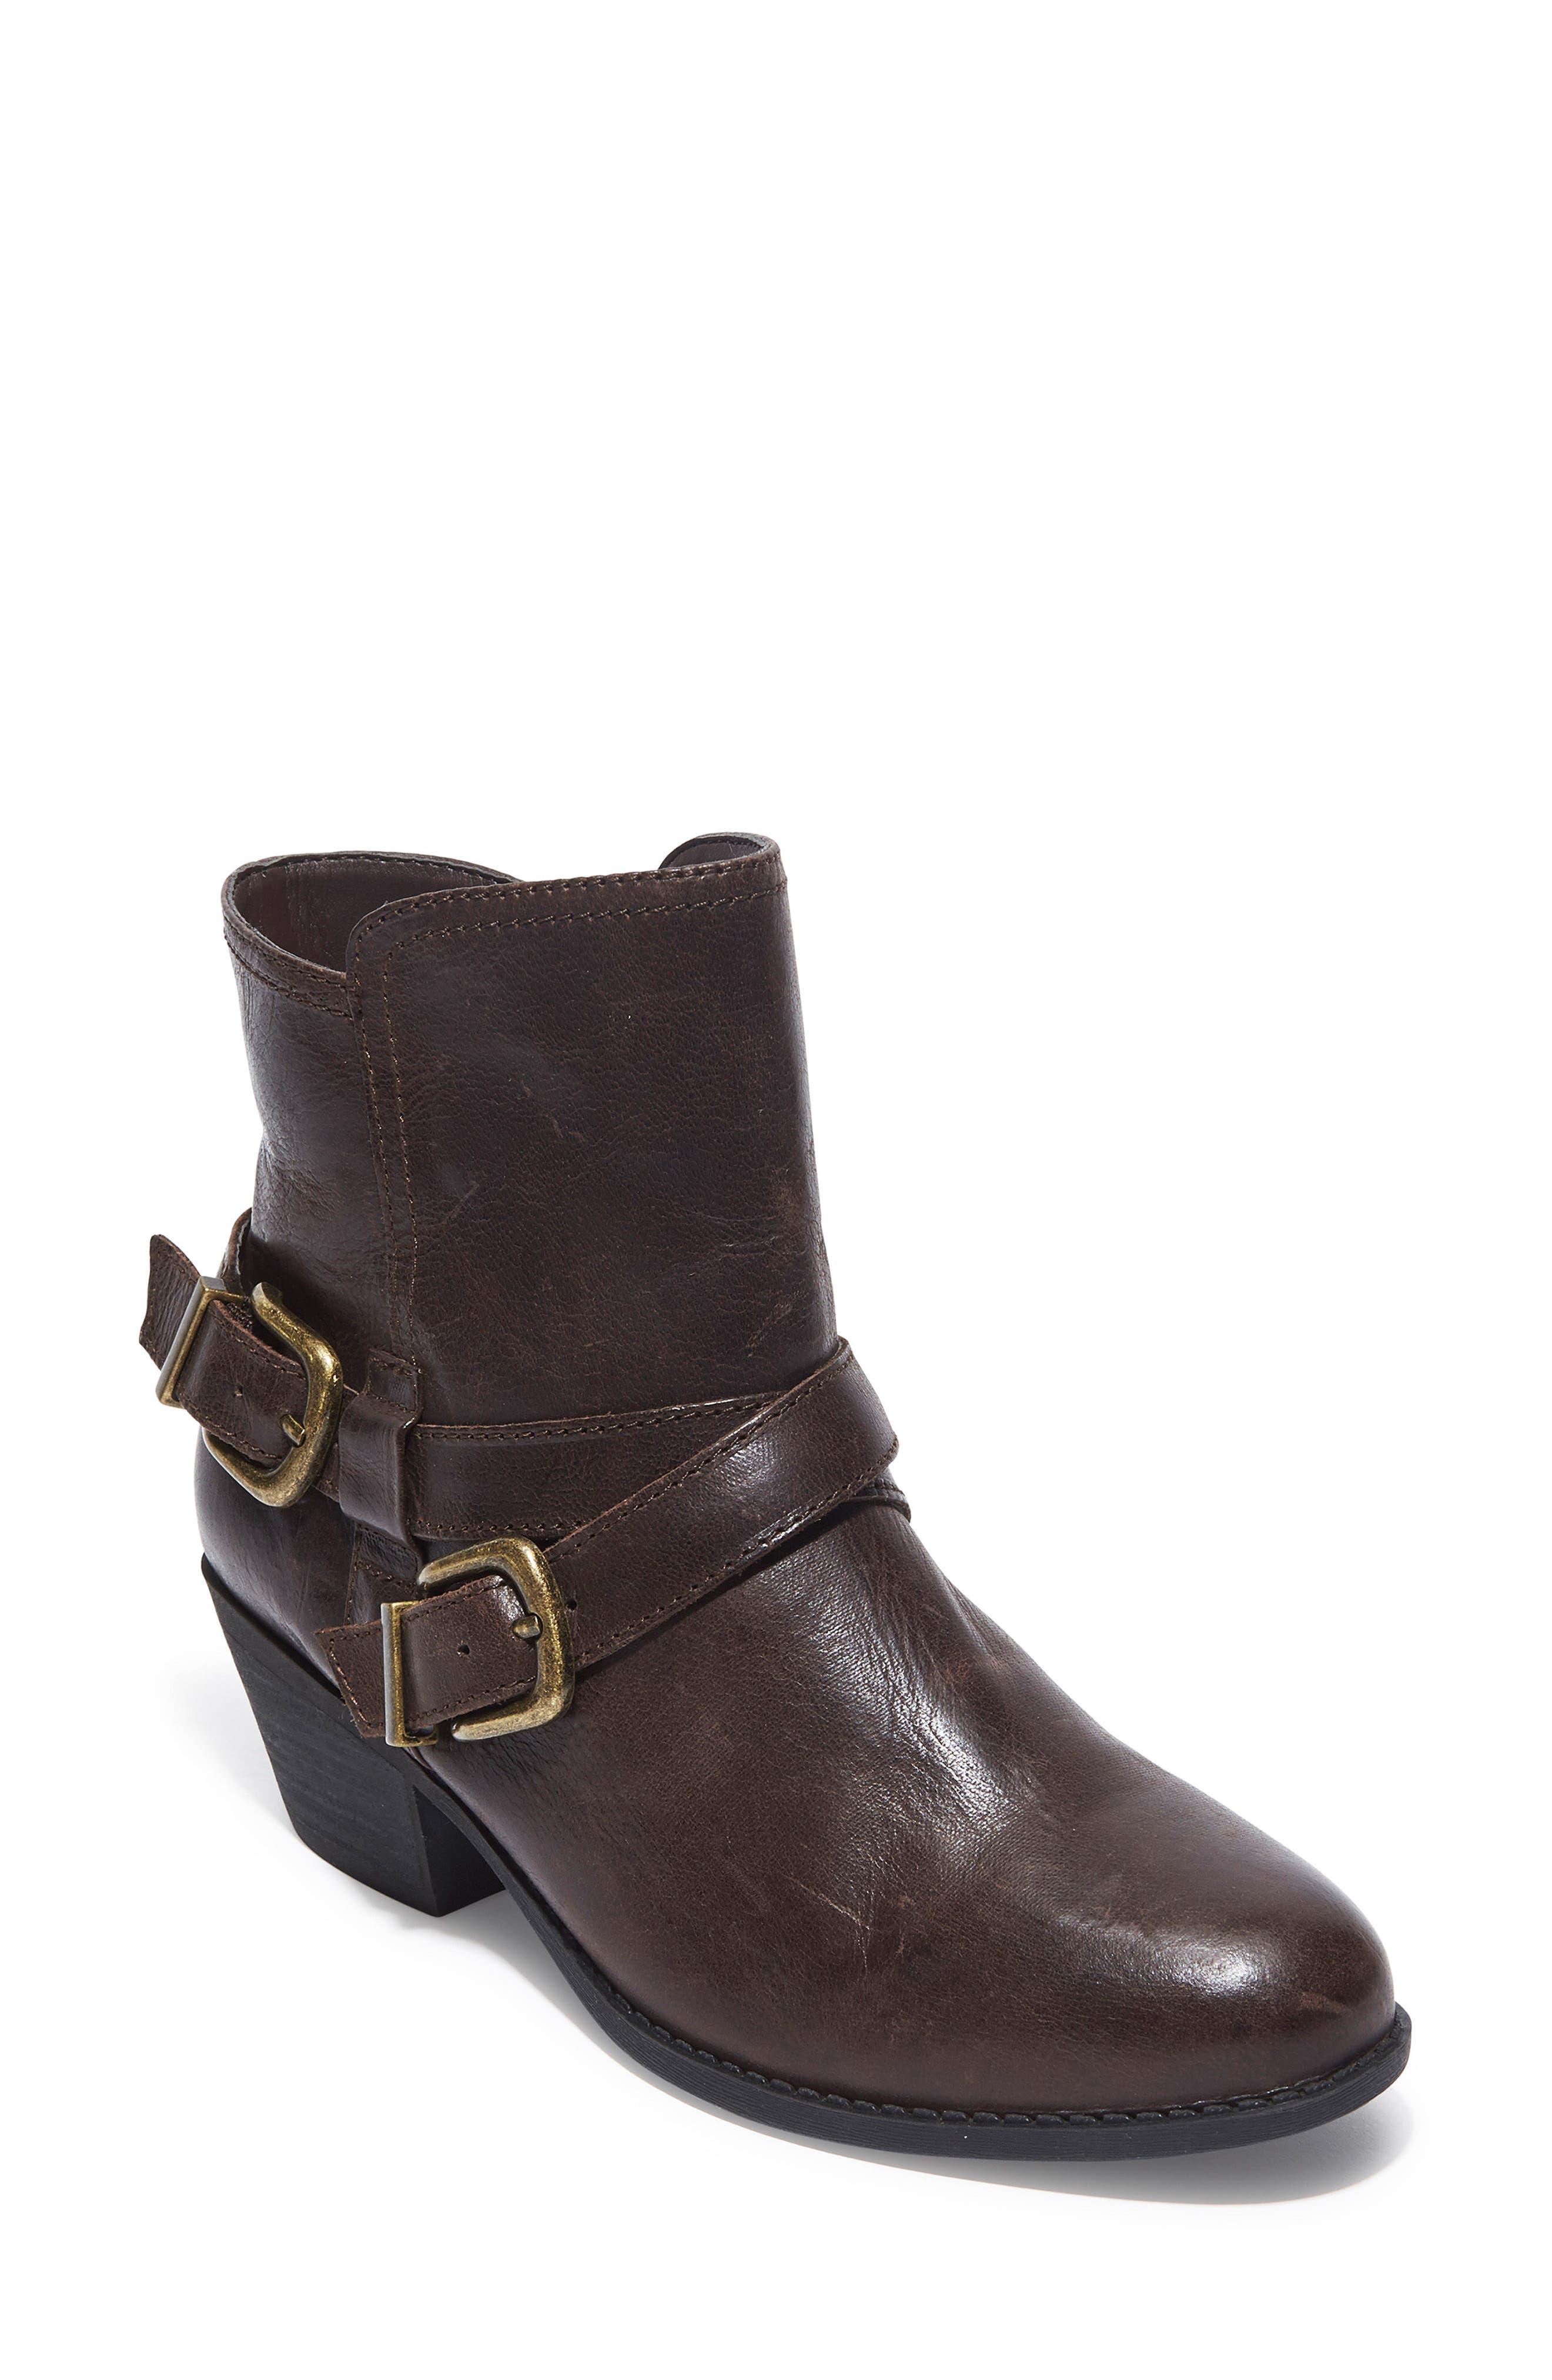 Zuri Buckle Boot,                         Main,                         color, Dark Luggage Leather